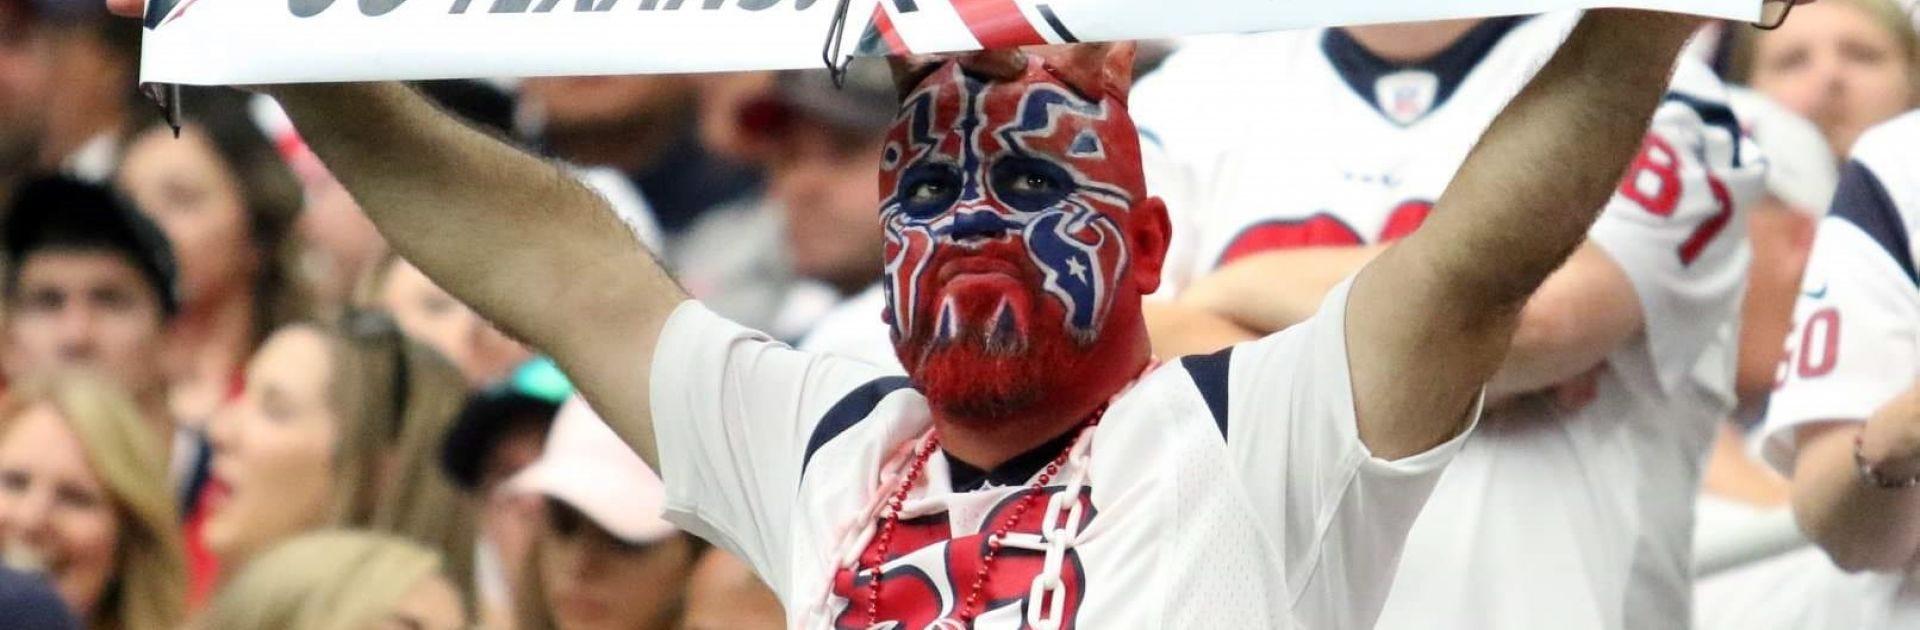 Super fan Houston Maul holding sign